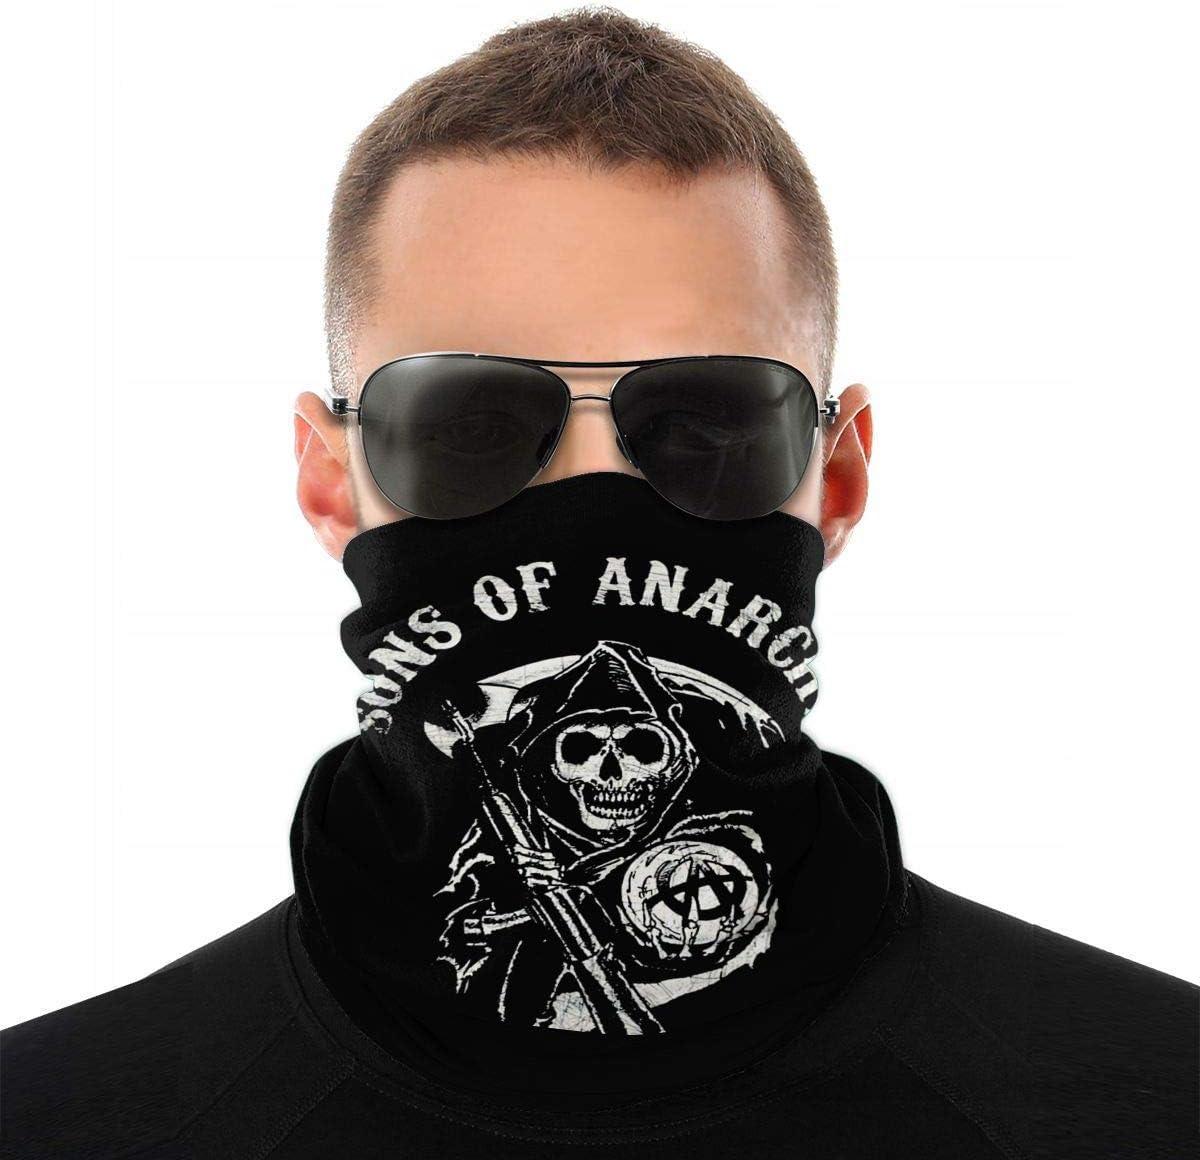 MUKPU Sons of Anarchy Dustproof Windproof Mascarilla Pa/ñuelos Bufanda Multifuncional Pasamonta/ñas de Polaina de Cuello